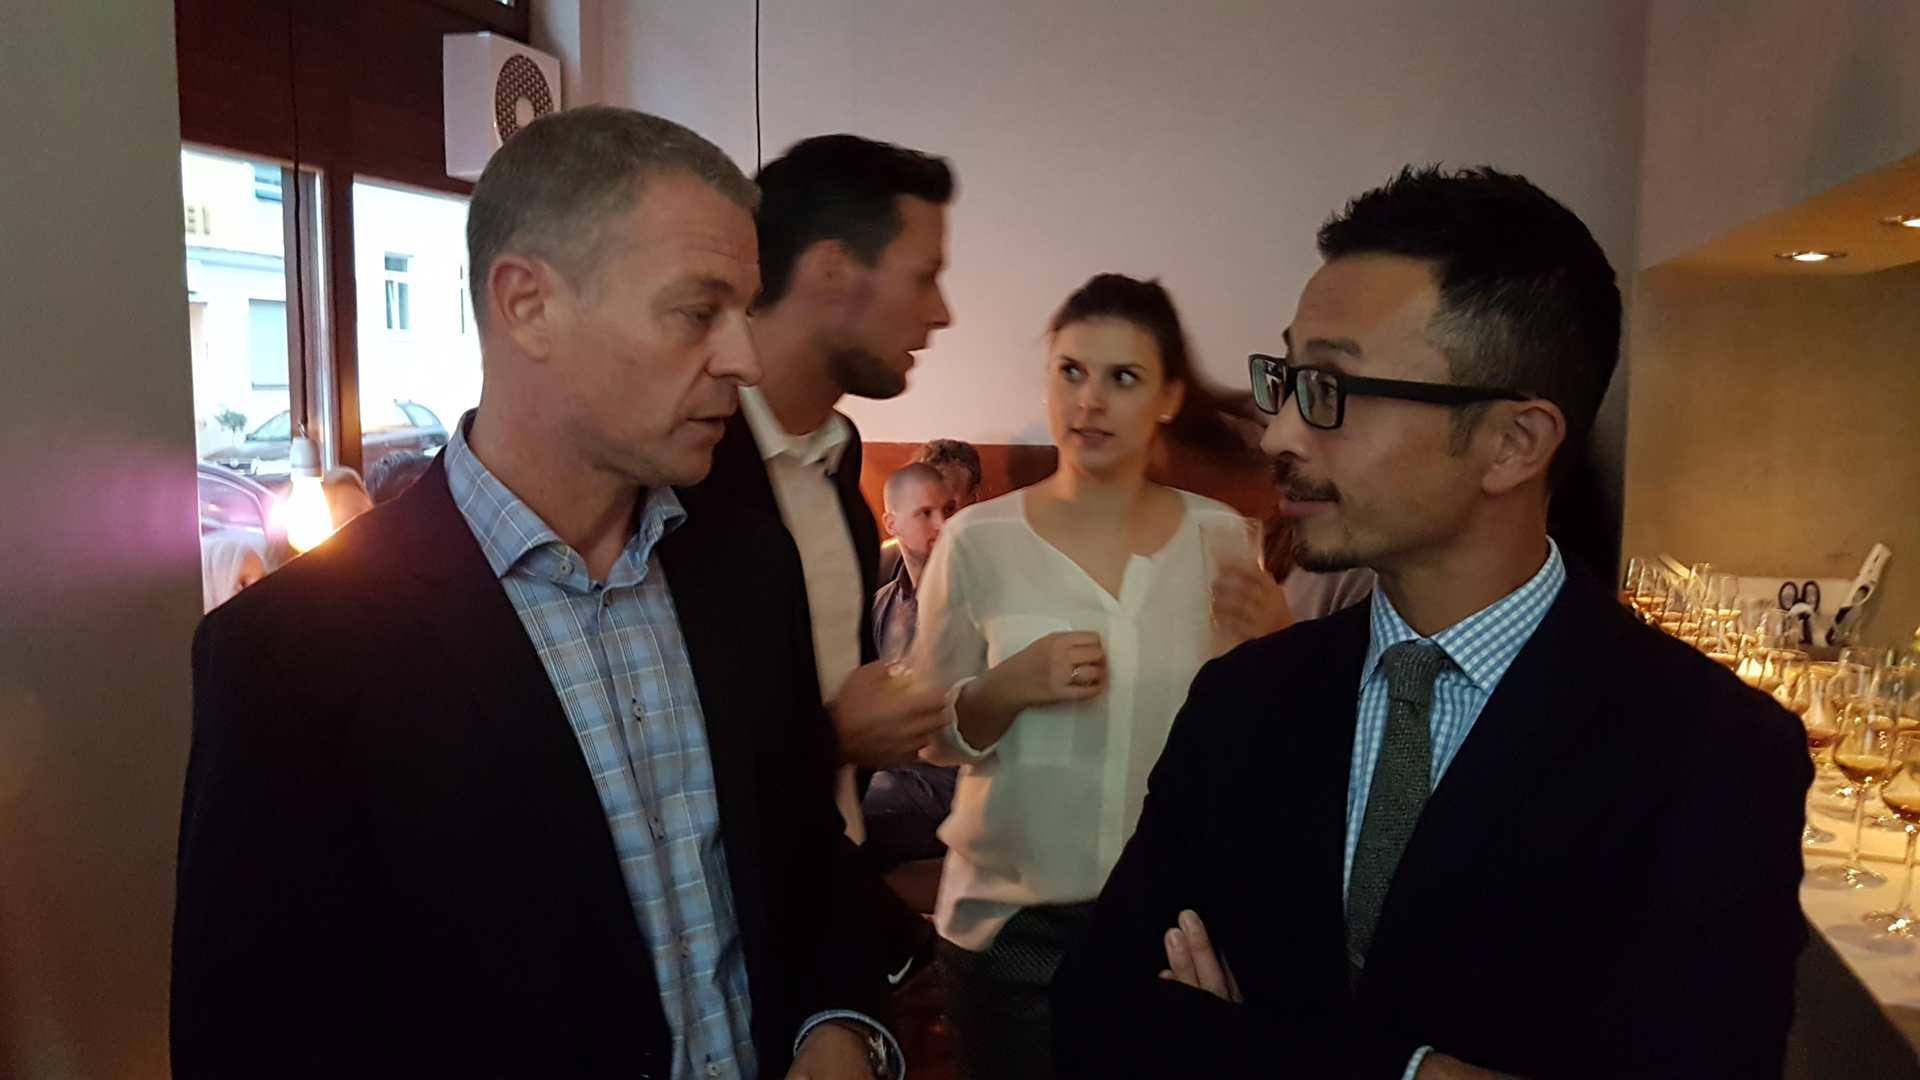 Jens Riosenberg (Beam Suntory) und Tatsuya Minagawa im Gespräch